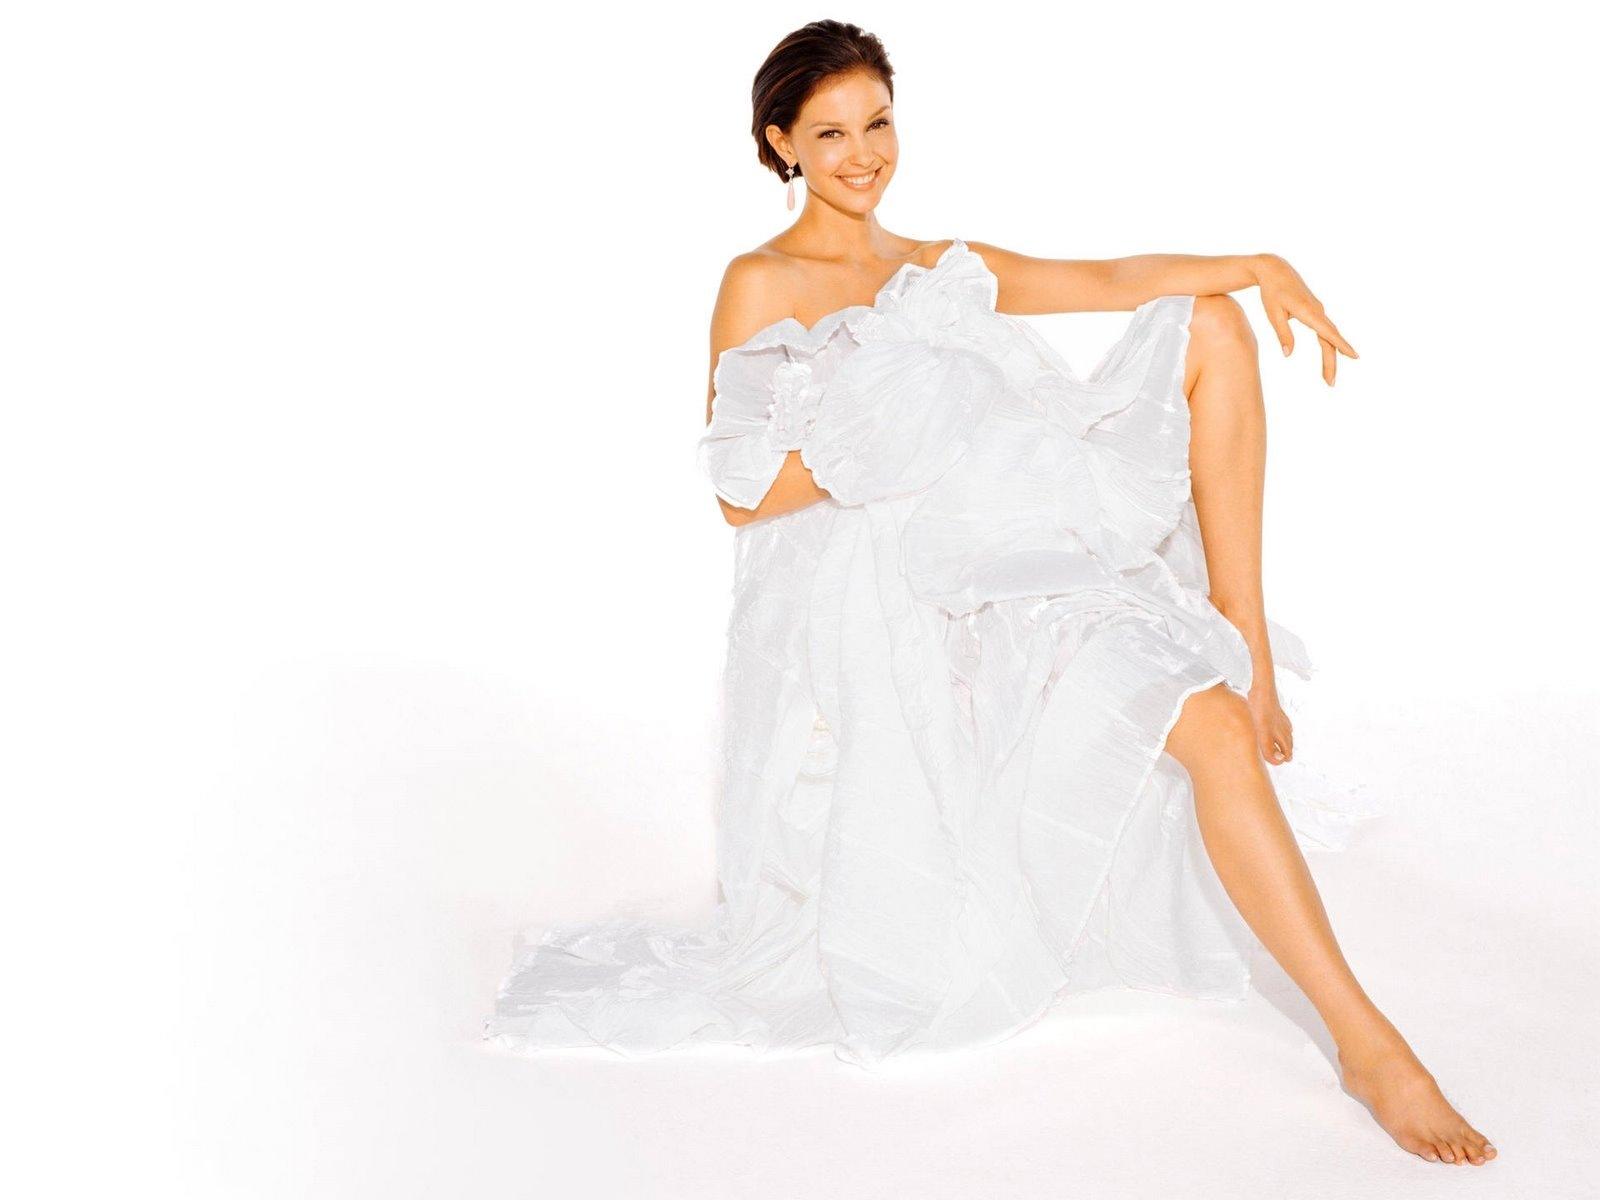 [Ashley Judd 11 1600x1200 hqmodelwallpapers[2].jpg]